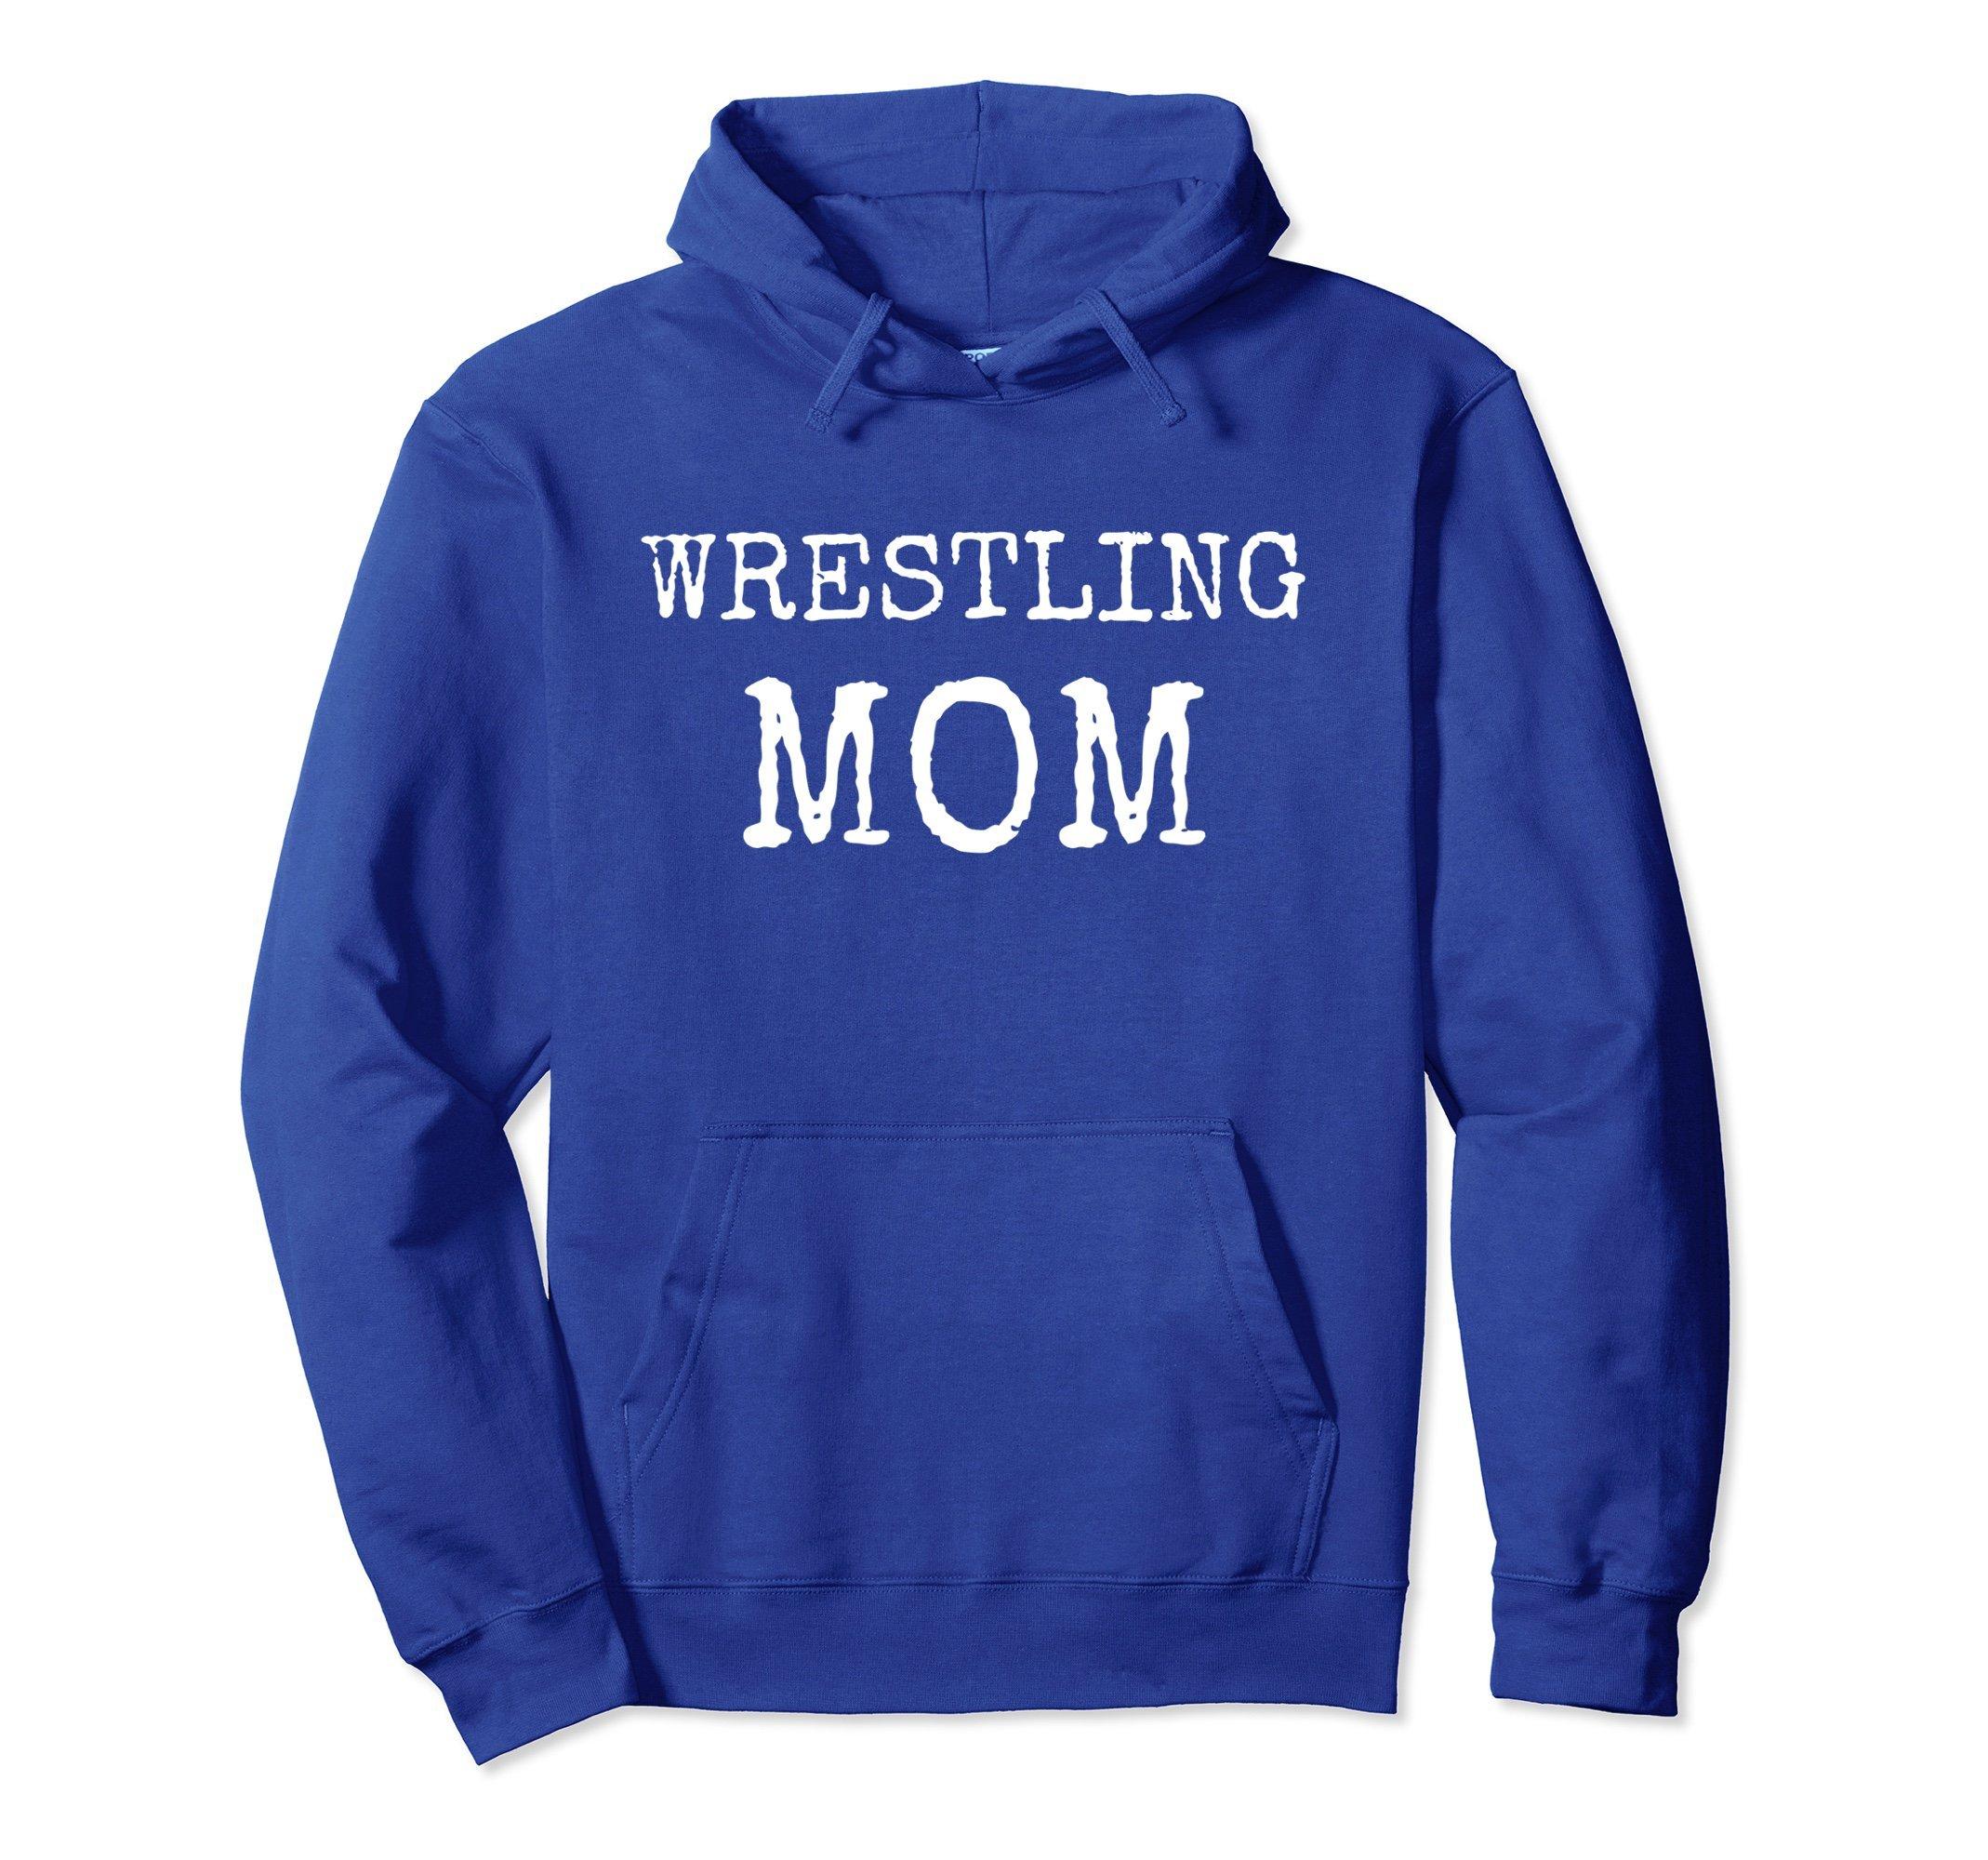 Unisex Wrestling Mom Hoodie - Wrestling Mom Hooded Sweatshirt Small Royal Blue